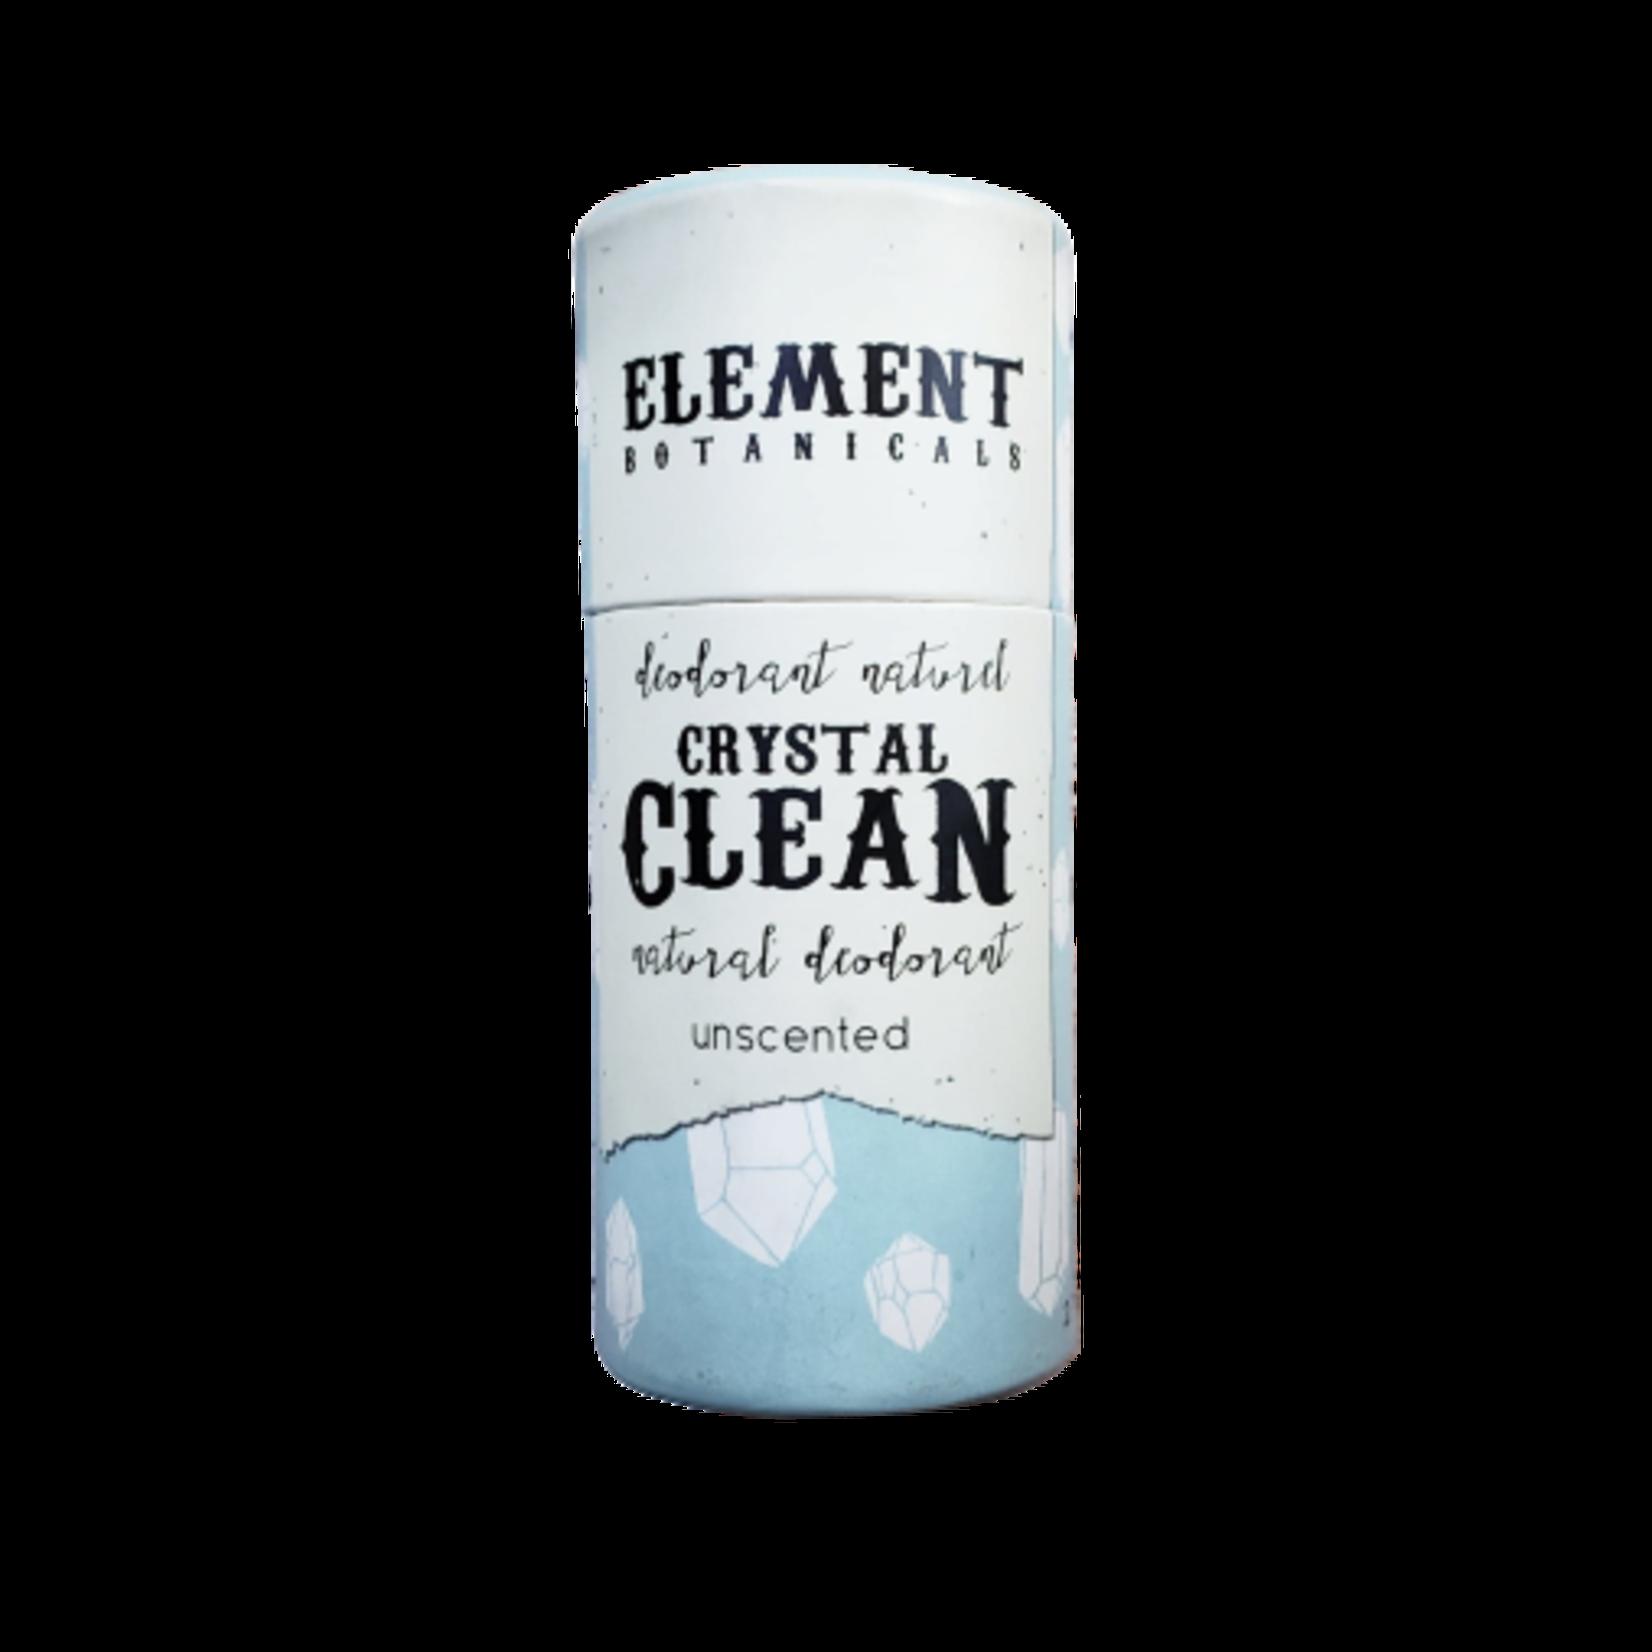 ELEMENT BOTANICALS Crystal Clean Deodorant